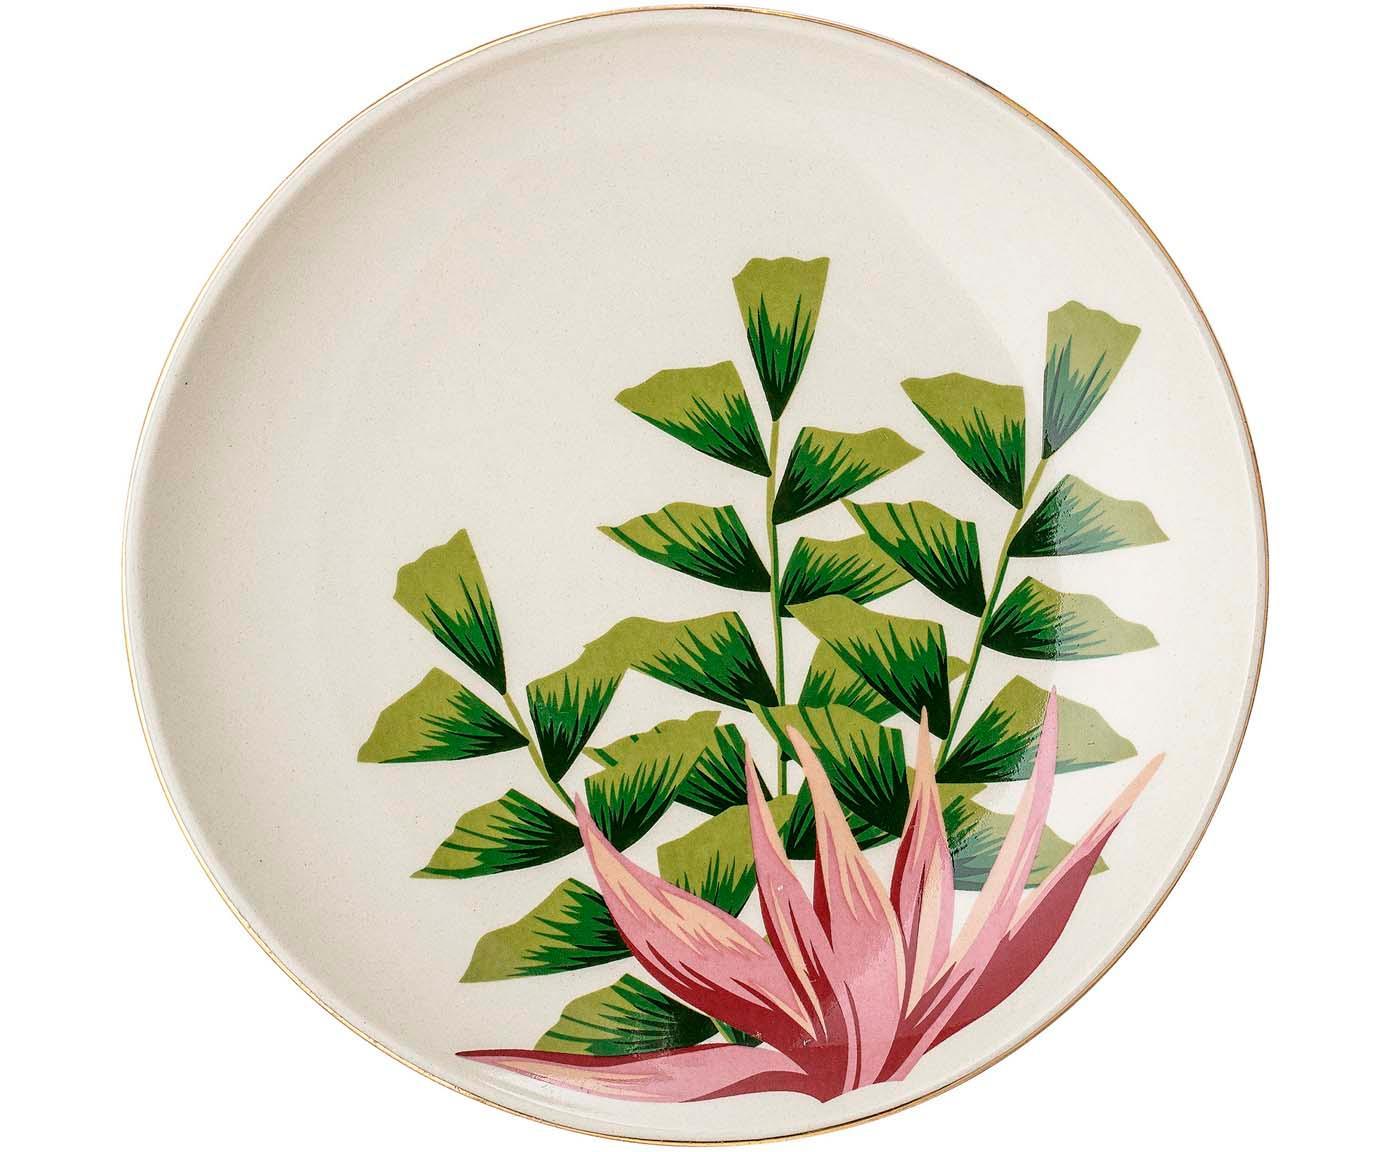 Frühstücksteller Moana mit Goldrand, Steingut, Weiß, Grün, Pink, Ø 16 cm